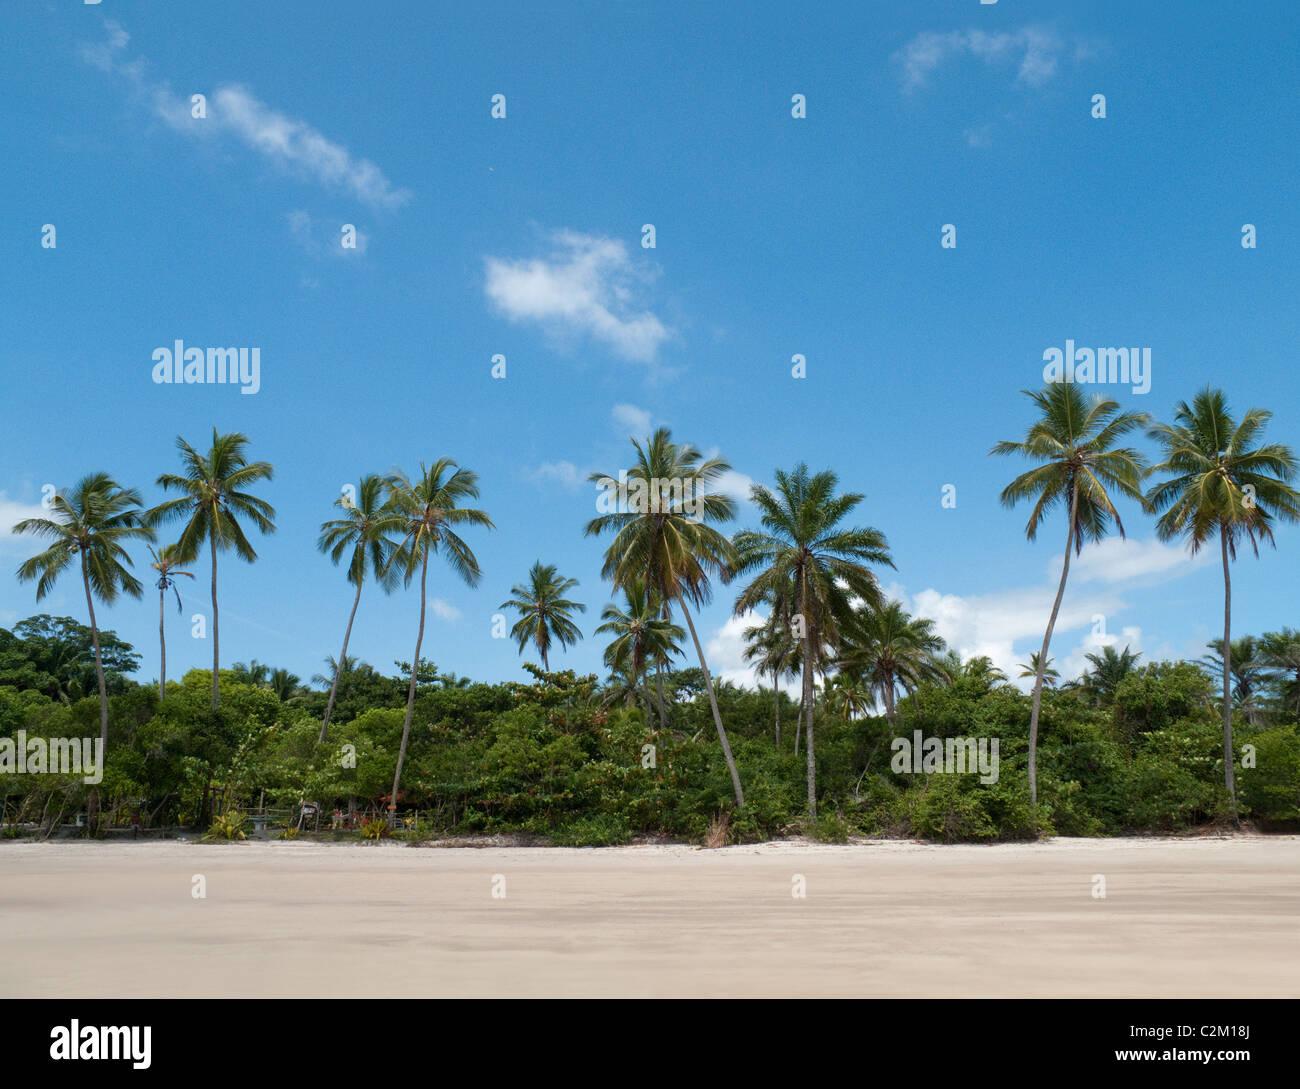 Palm trees on beach, Boipeba Island, Bahia, Brazil Stock Foto